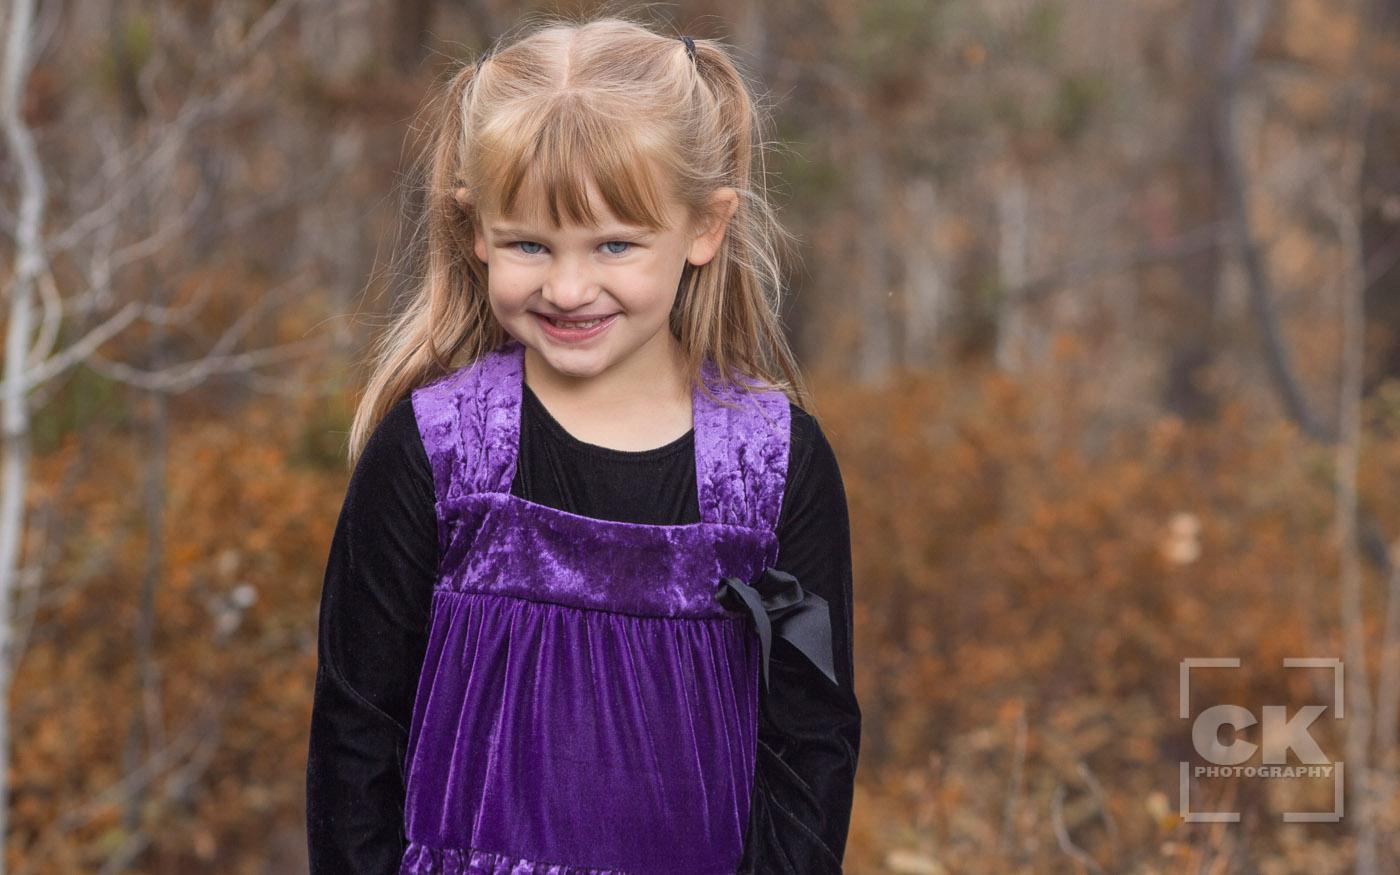 Chris Kryzanek Photography children - girl fall colors